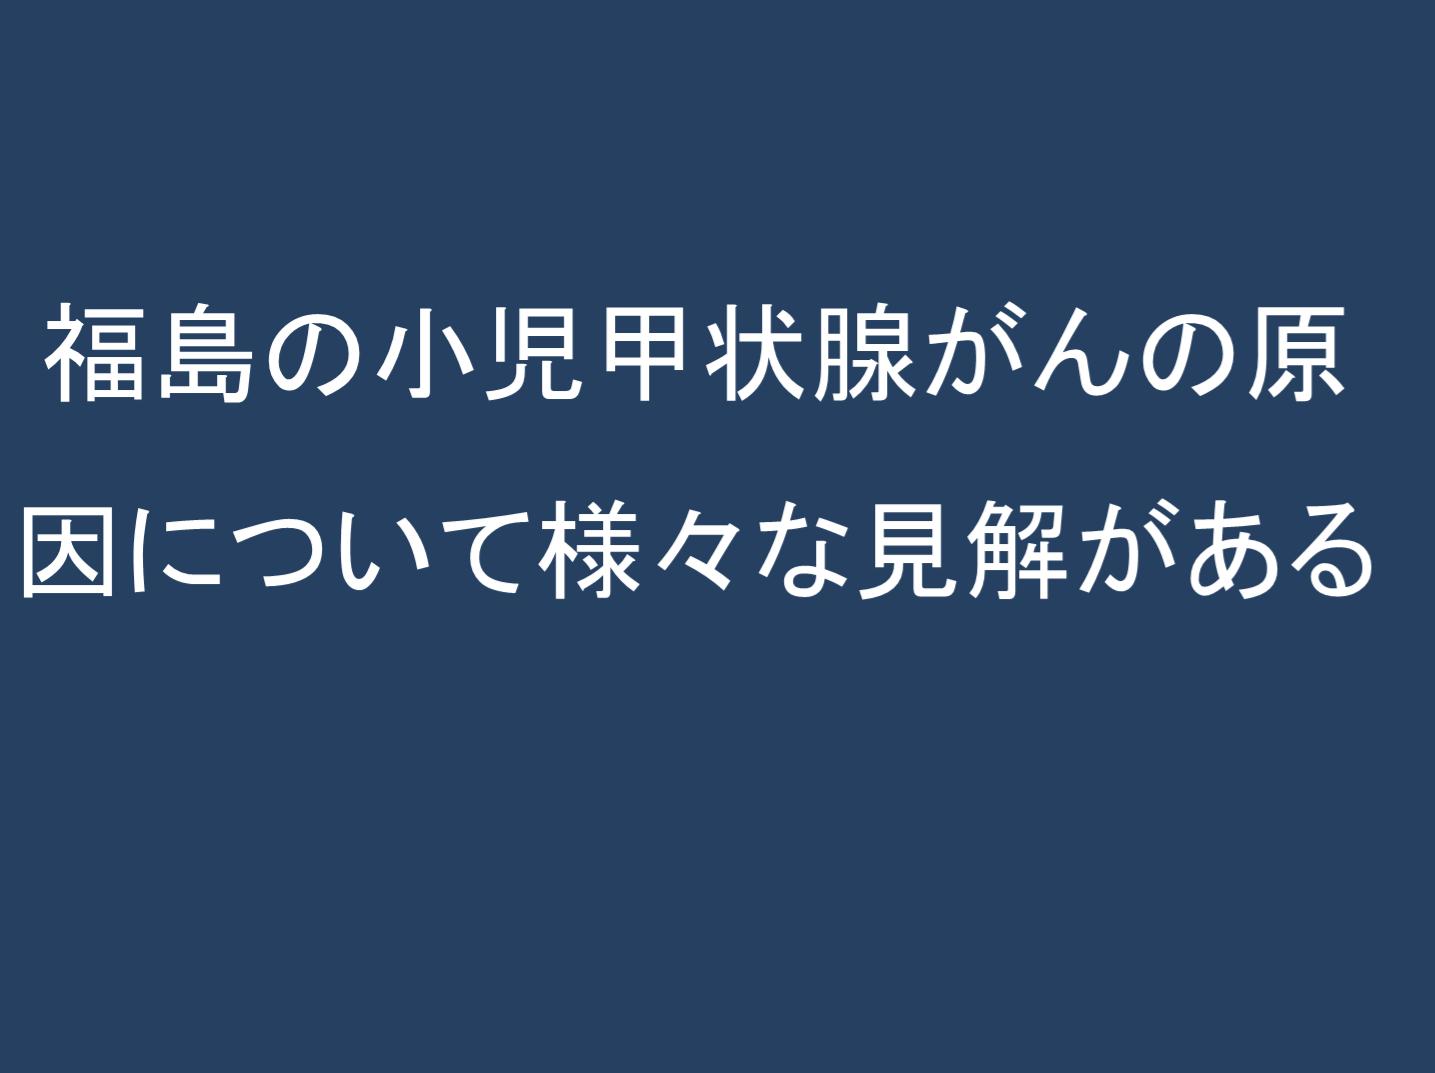 DrMatsuzaki005.png